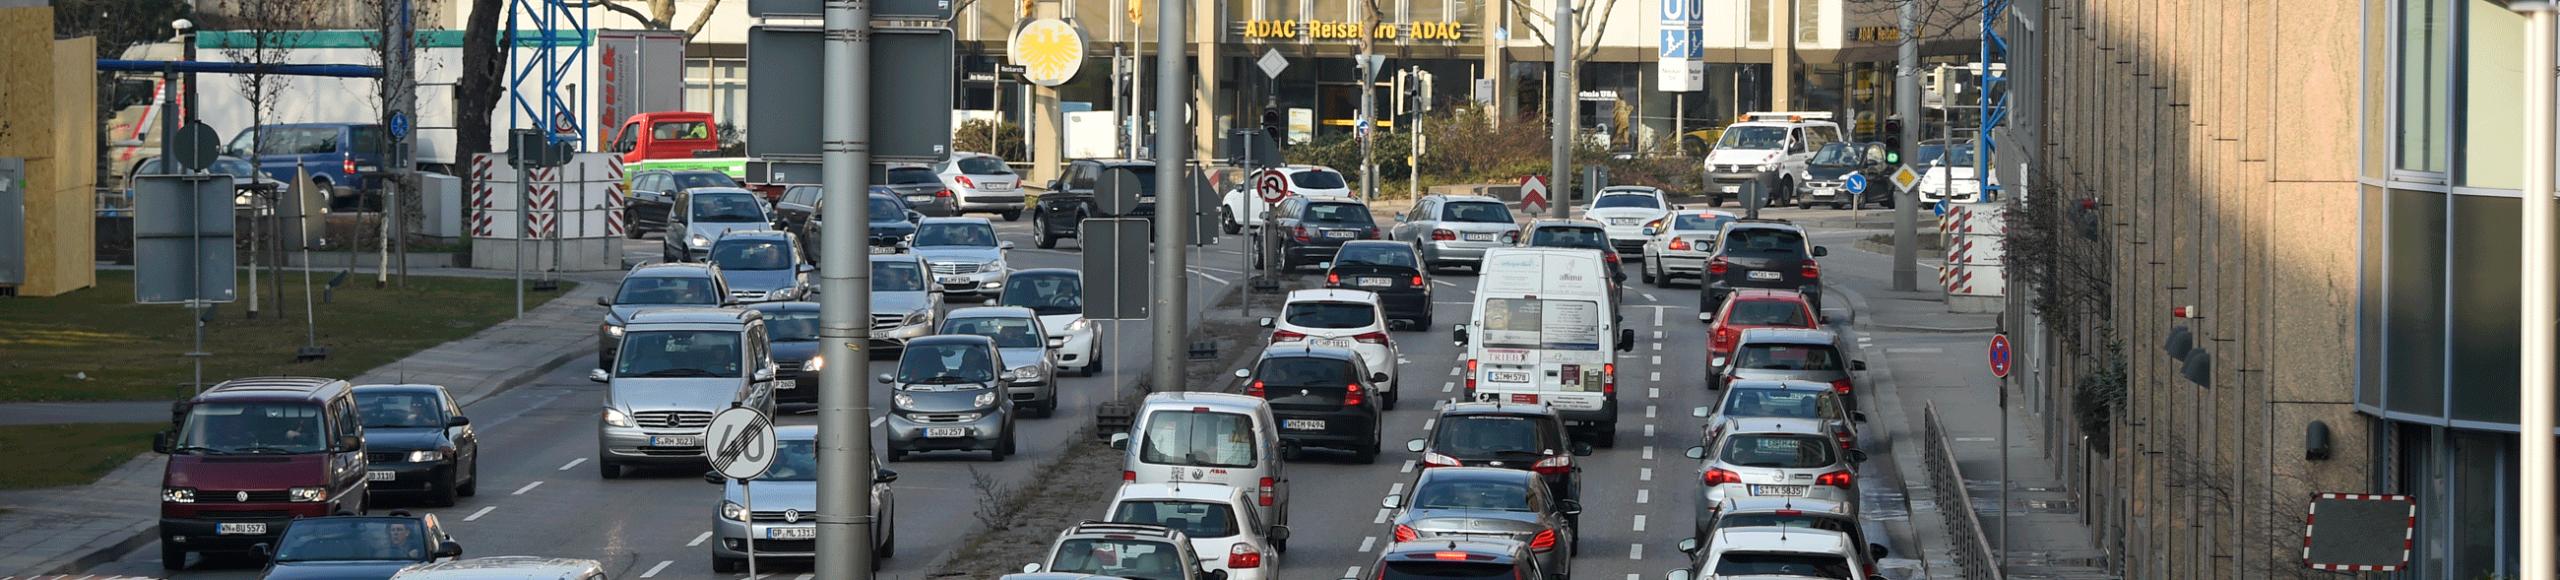 Auto Verkehr